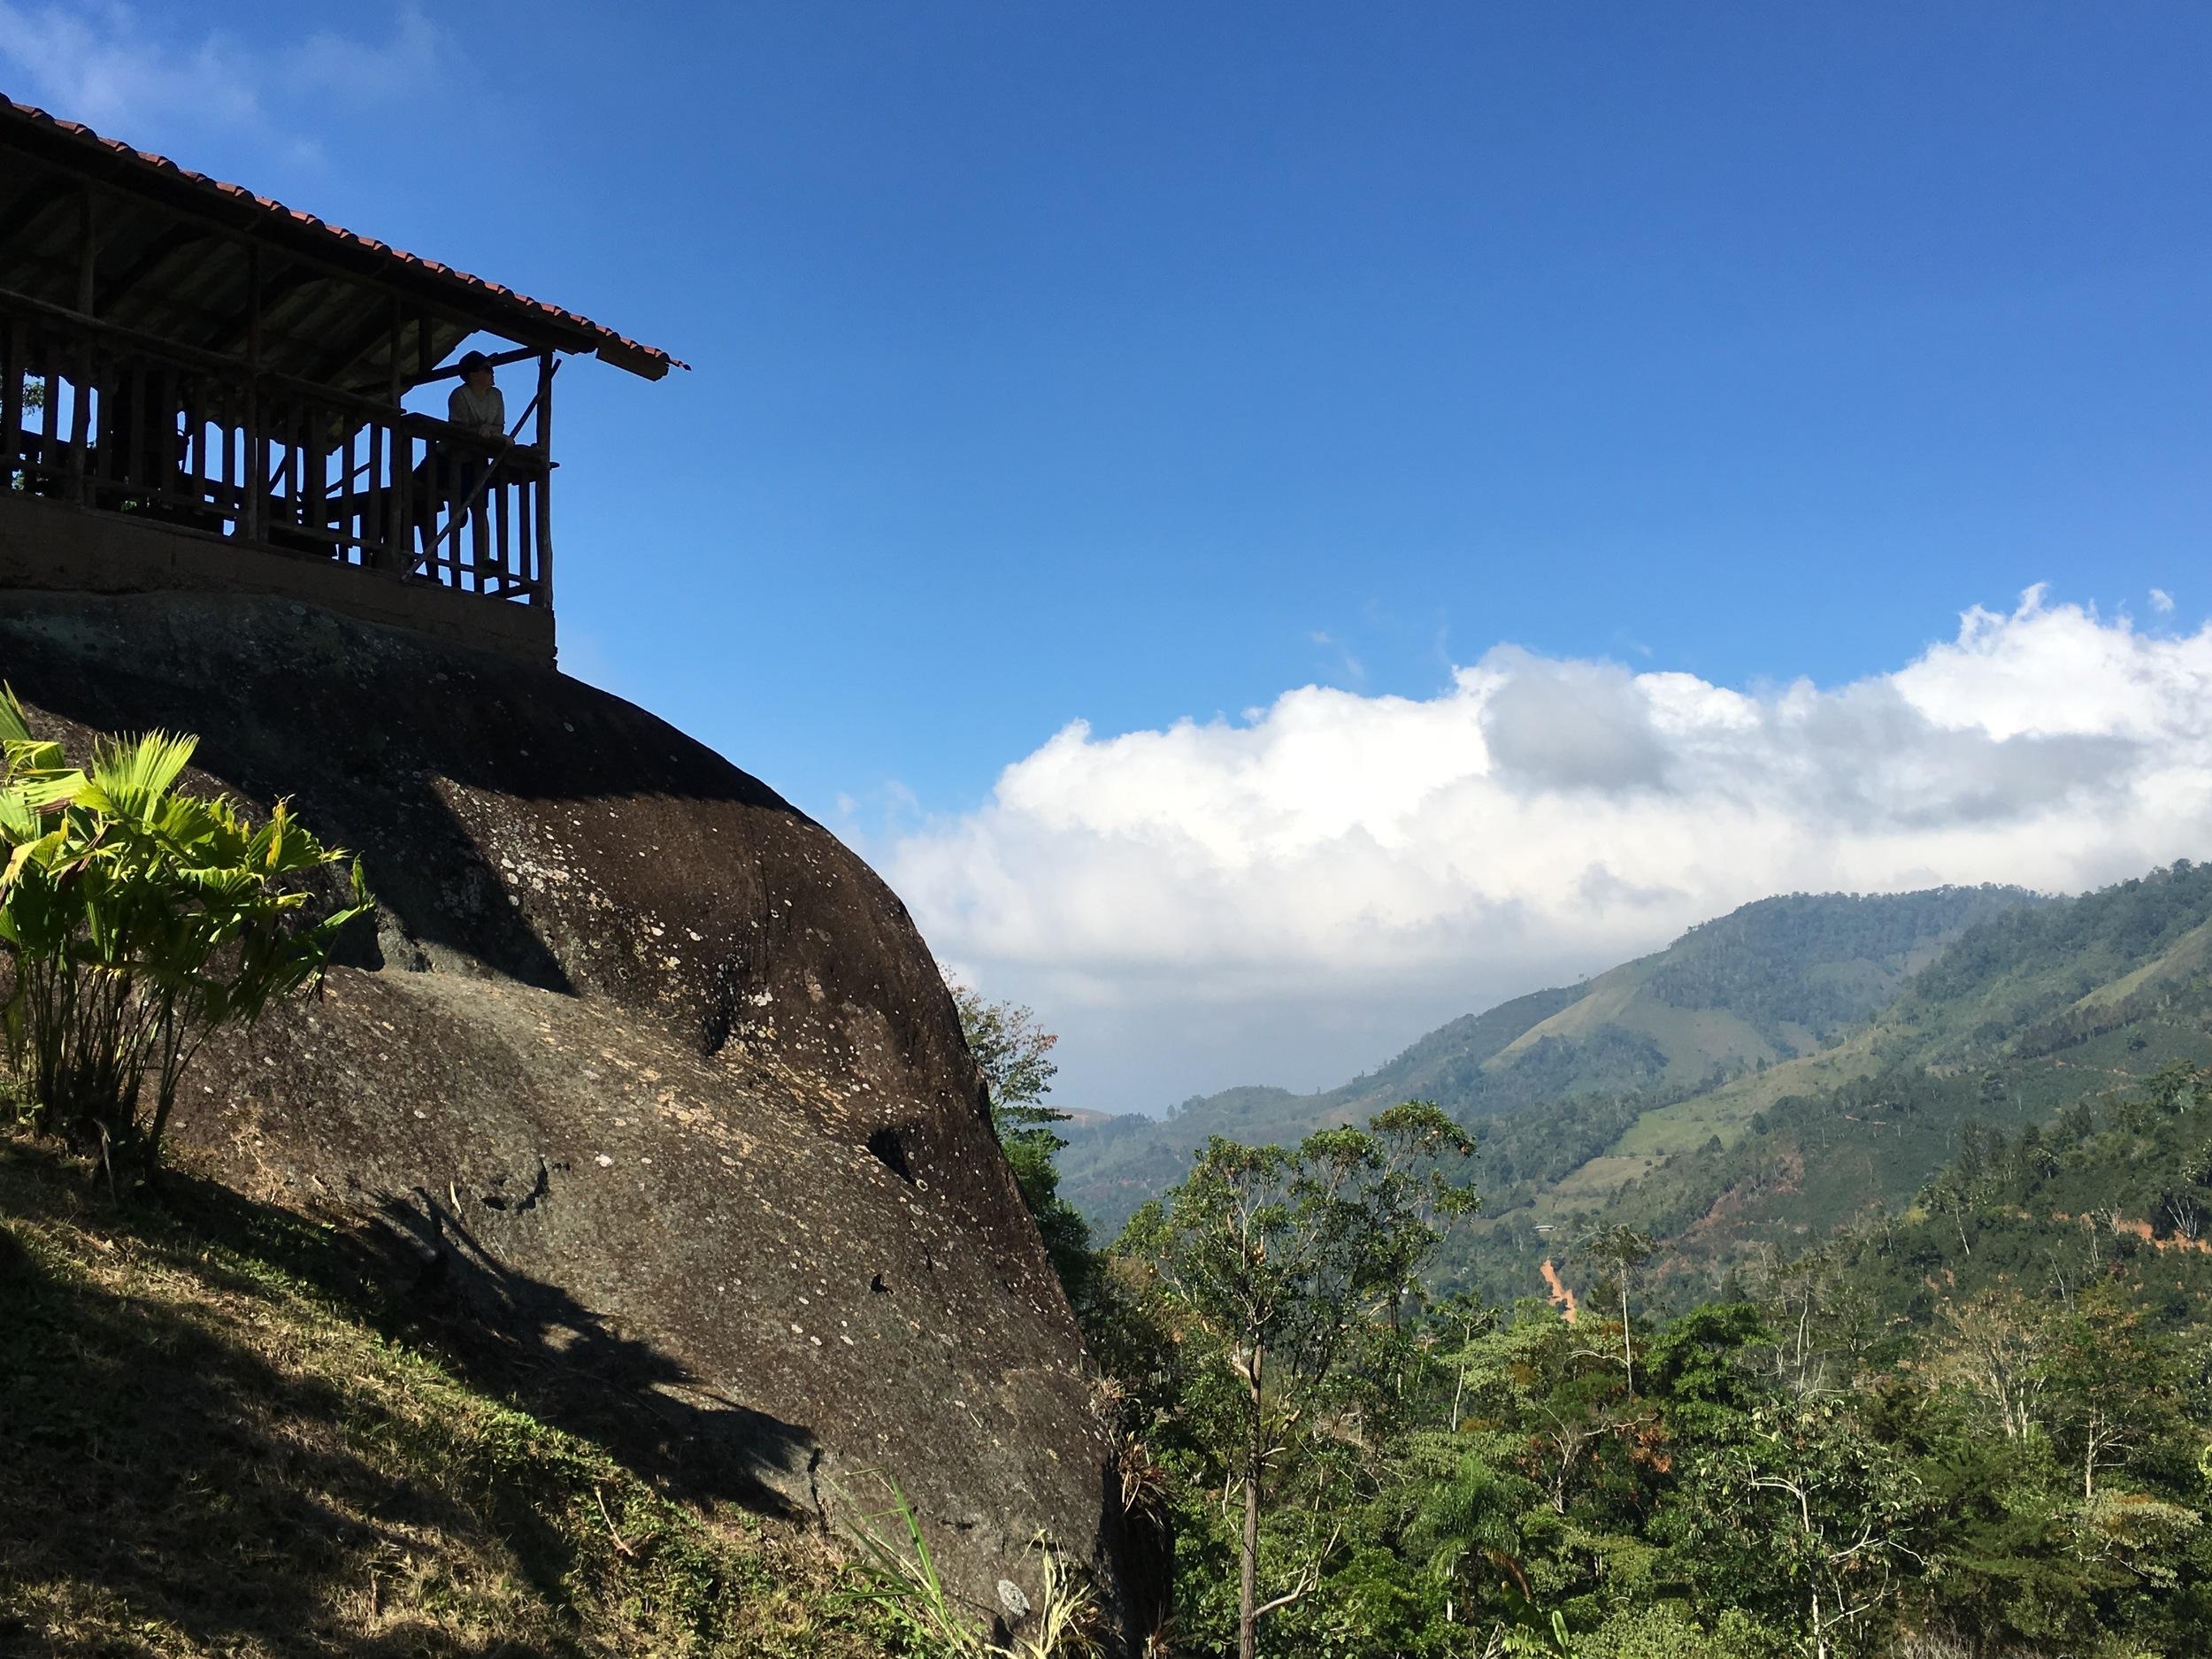 Costa-Rica-AltaGracia-22.jpg